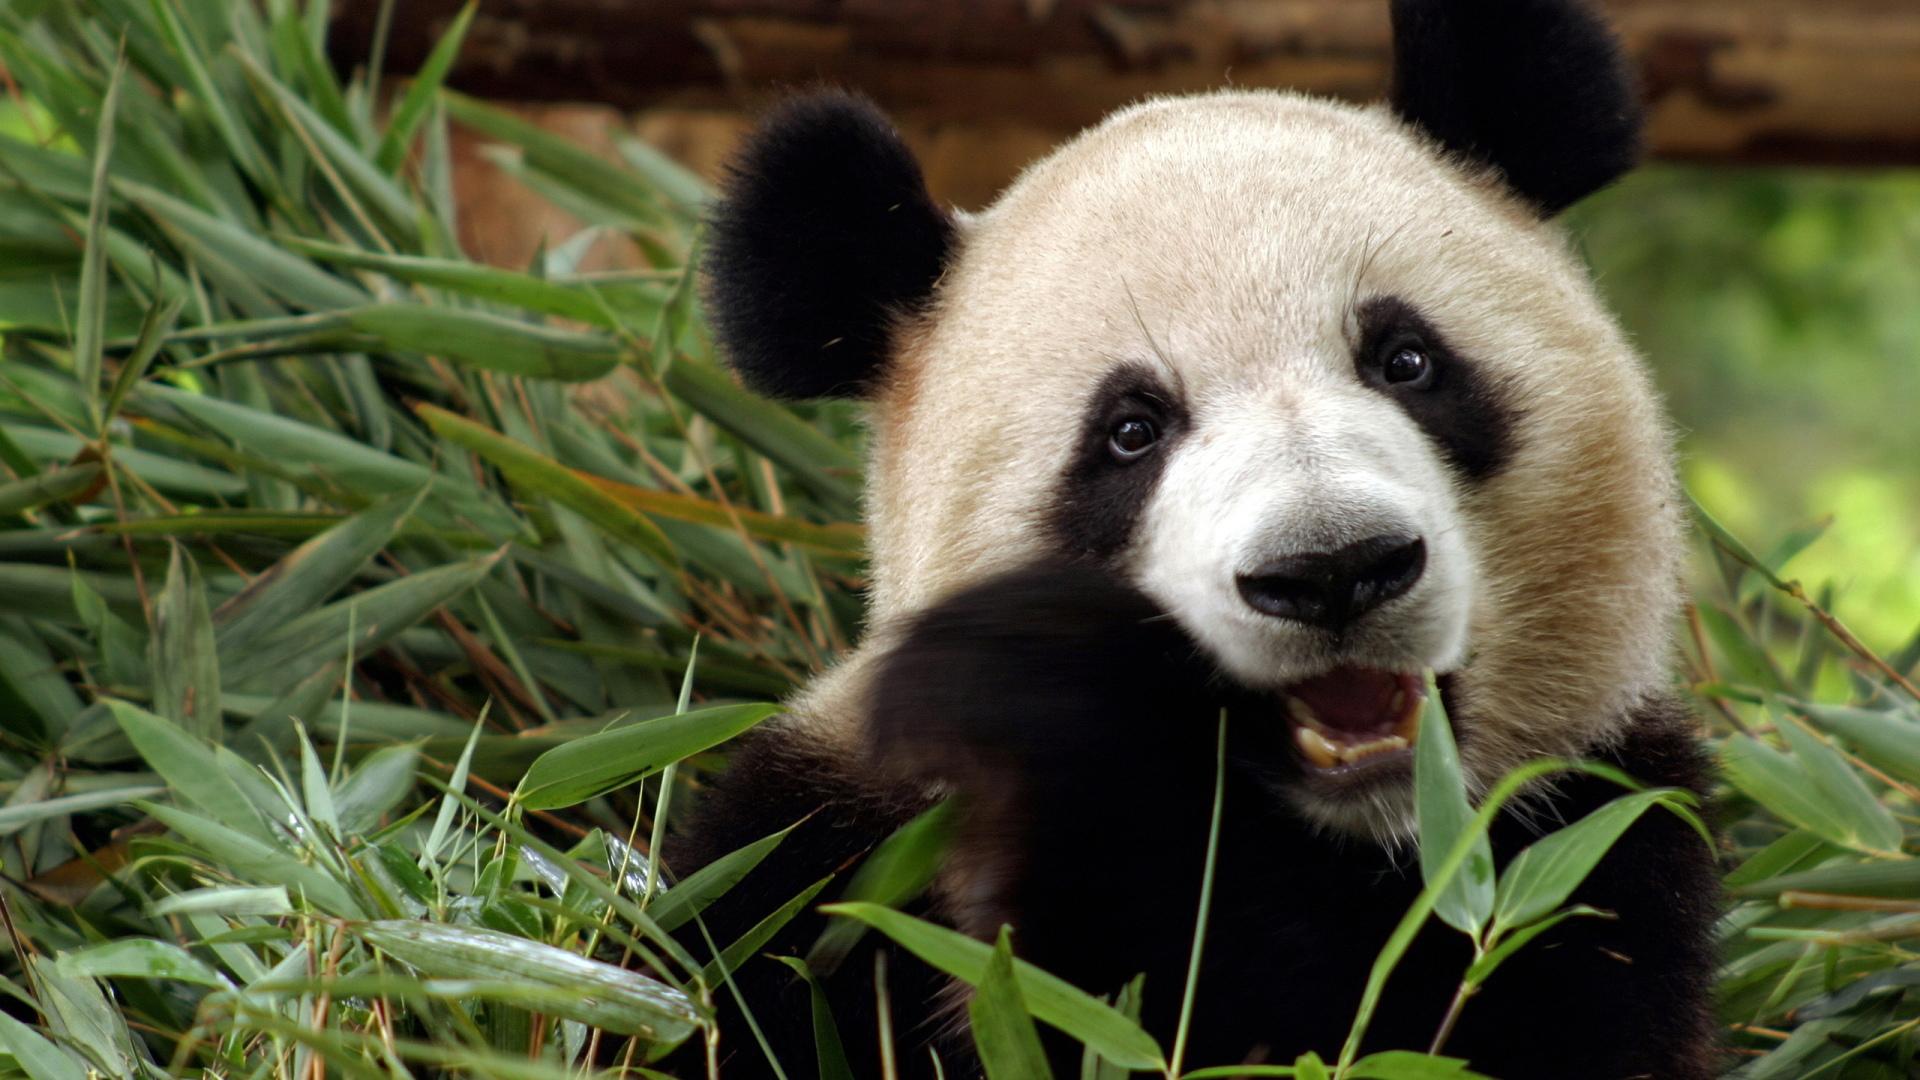 wars panda bear - photo #18